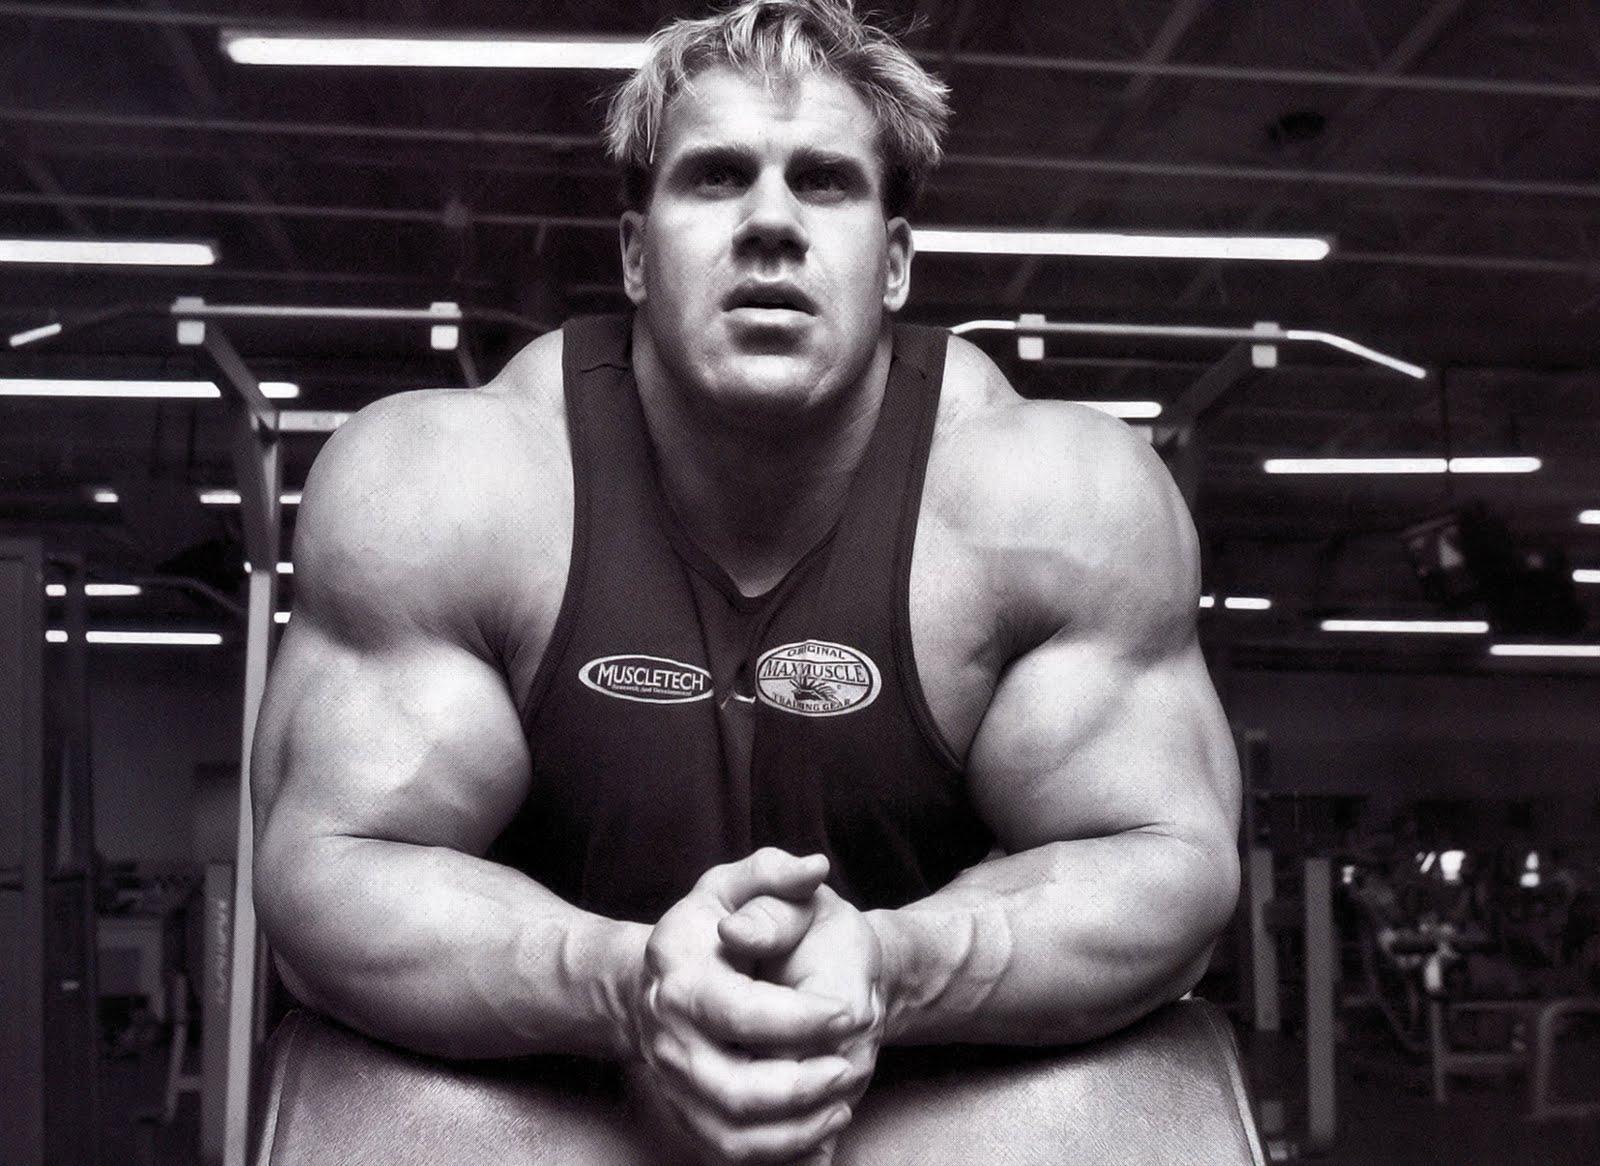 Best Celebrity: Jay Cutler Body Builder